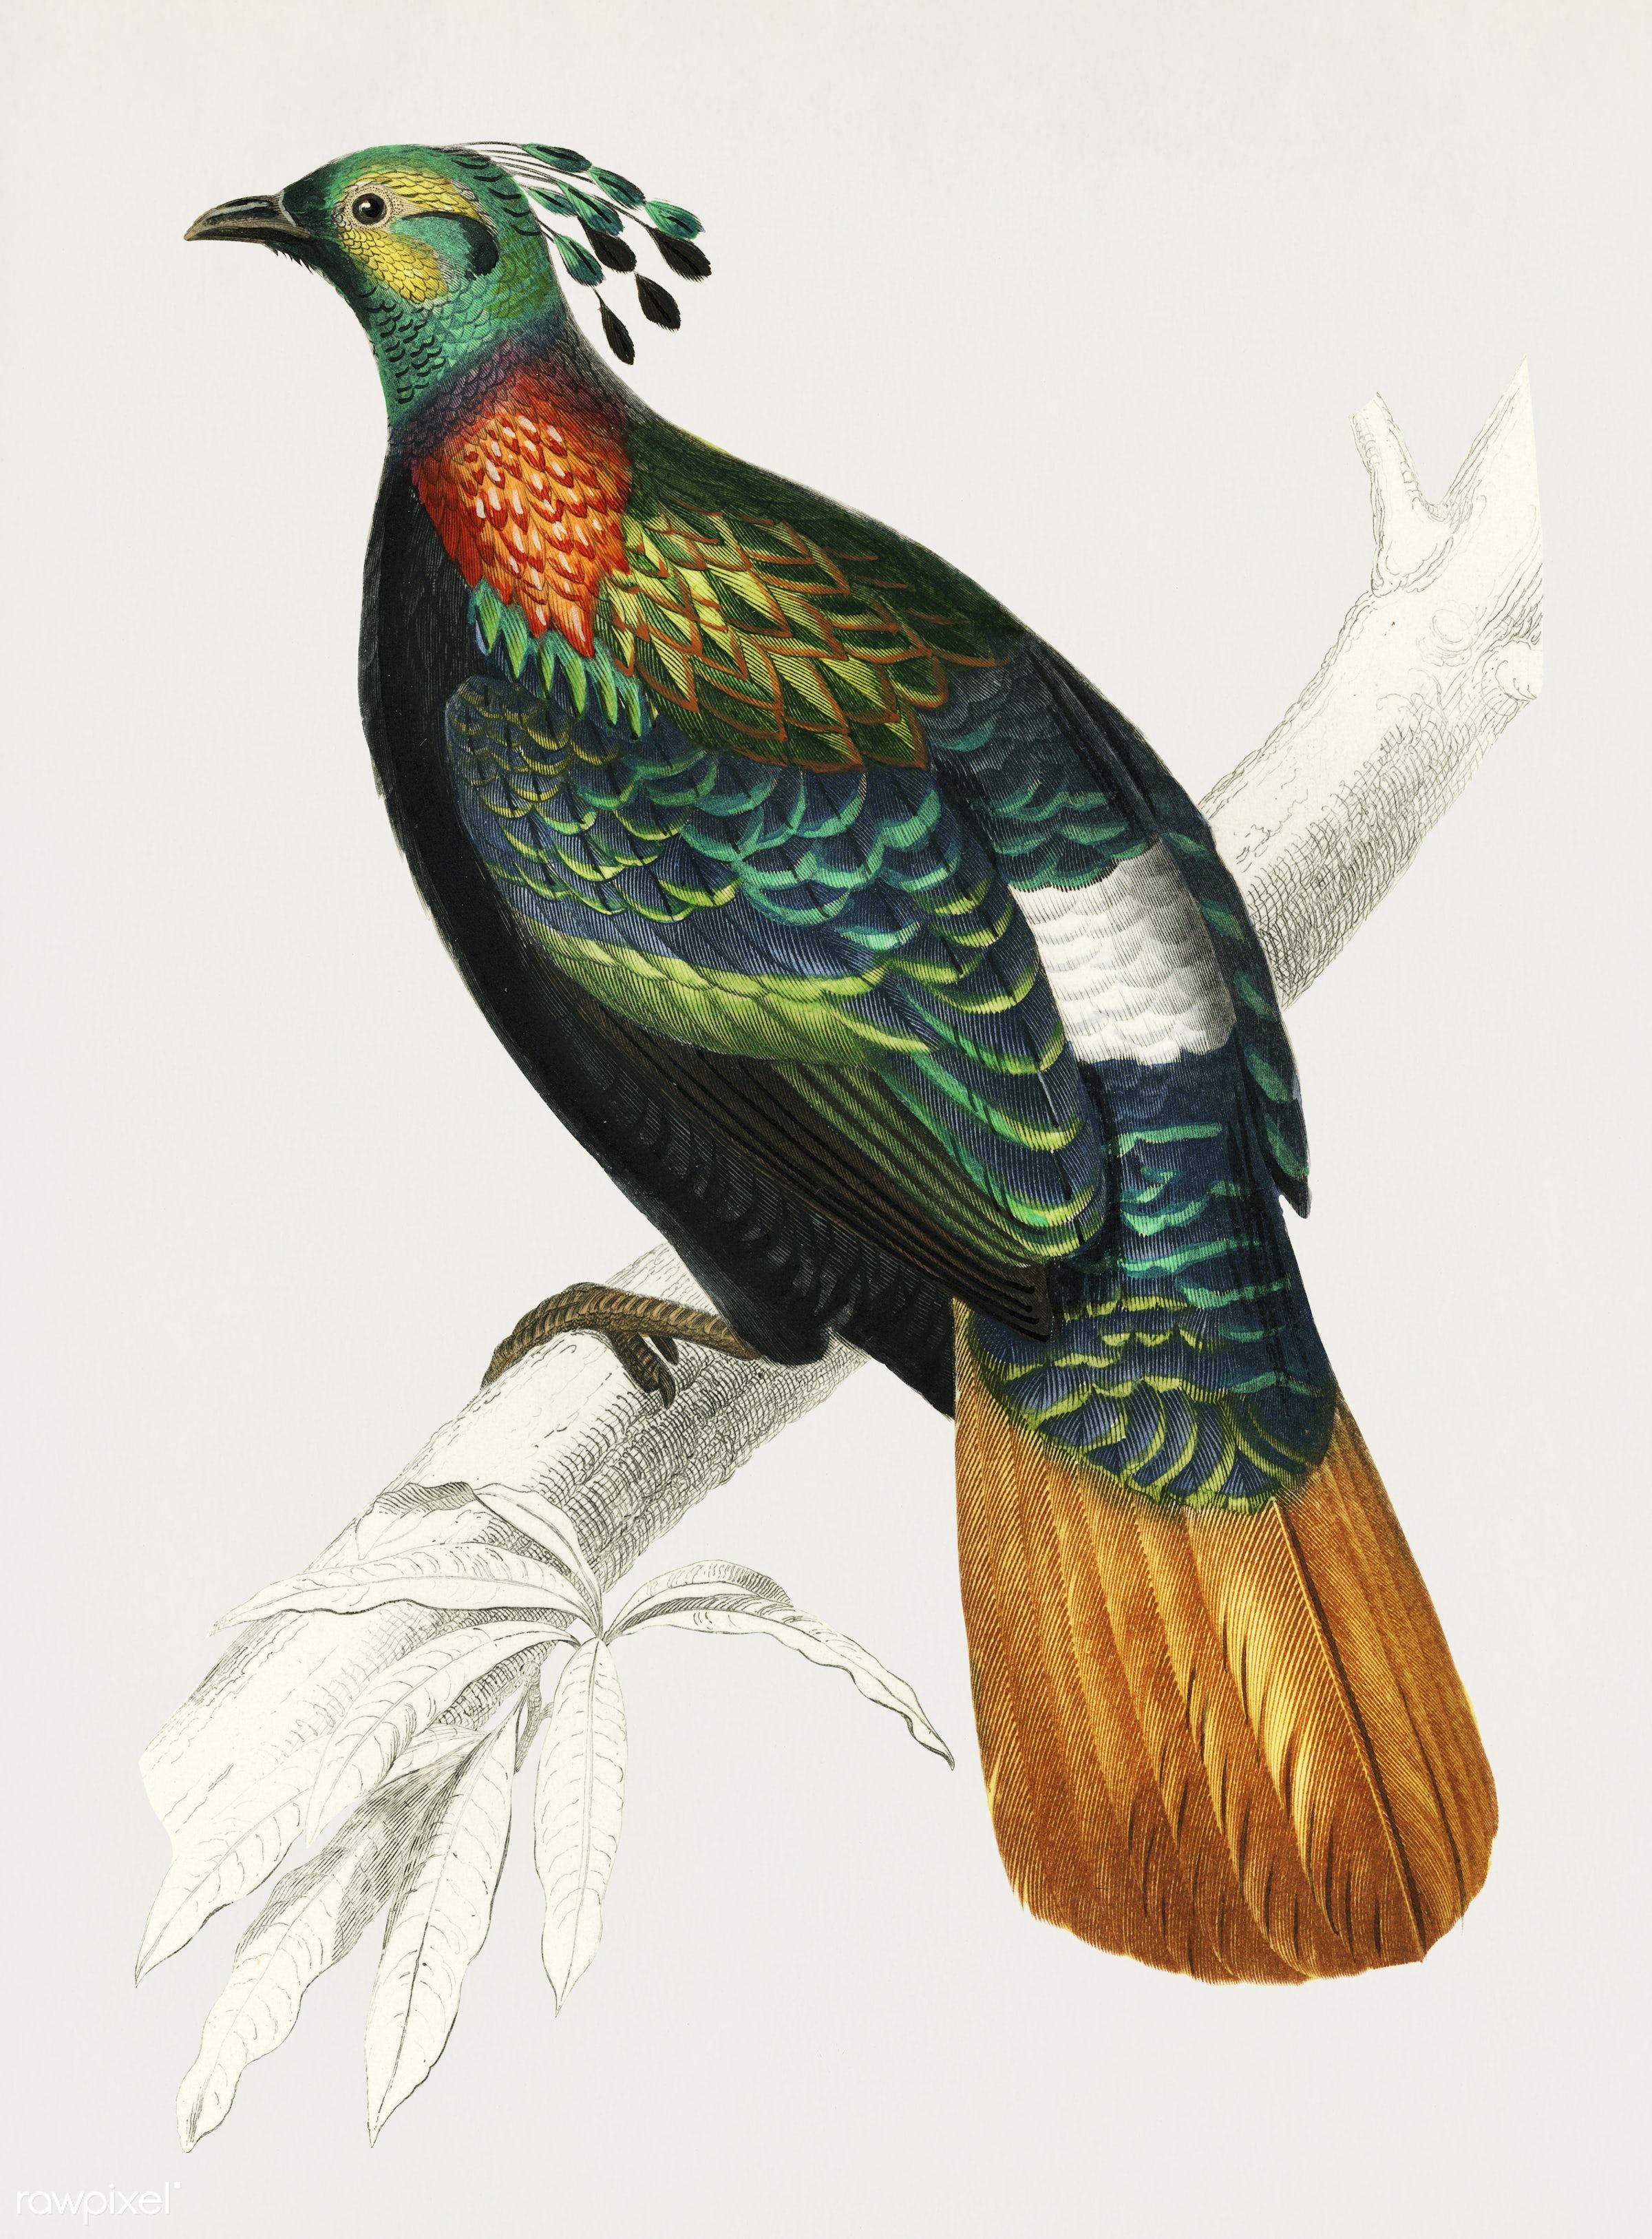 Vintage Illustration of Himalayan monal (Lophophorus refulgens) - orbigny, ancient, animal, antique, artwork, bird, charles...